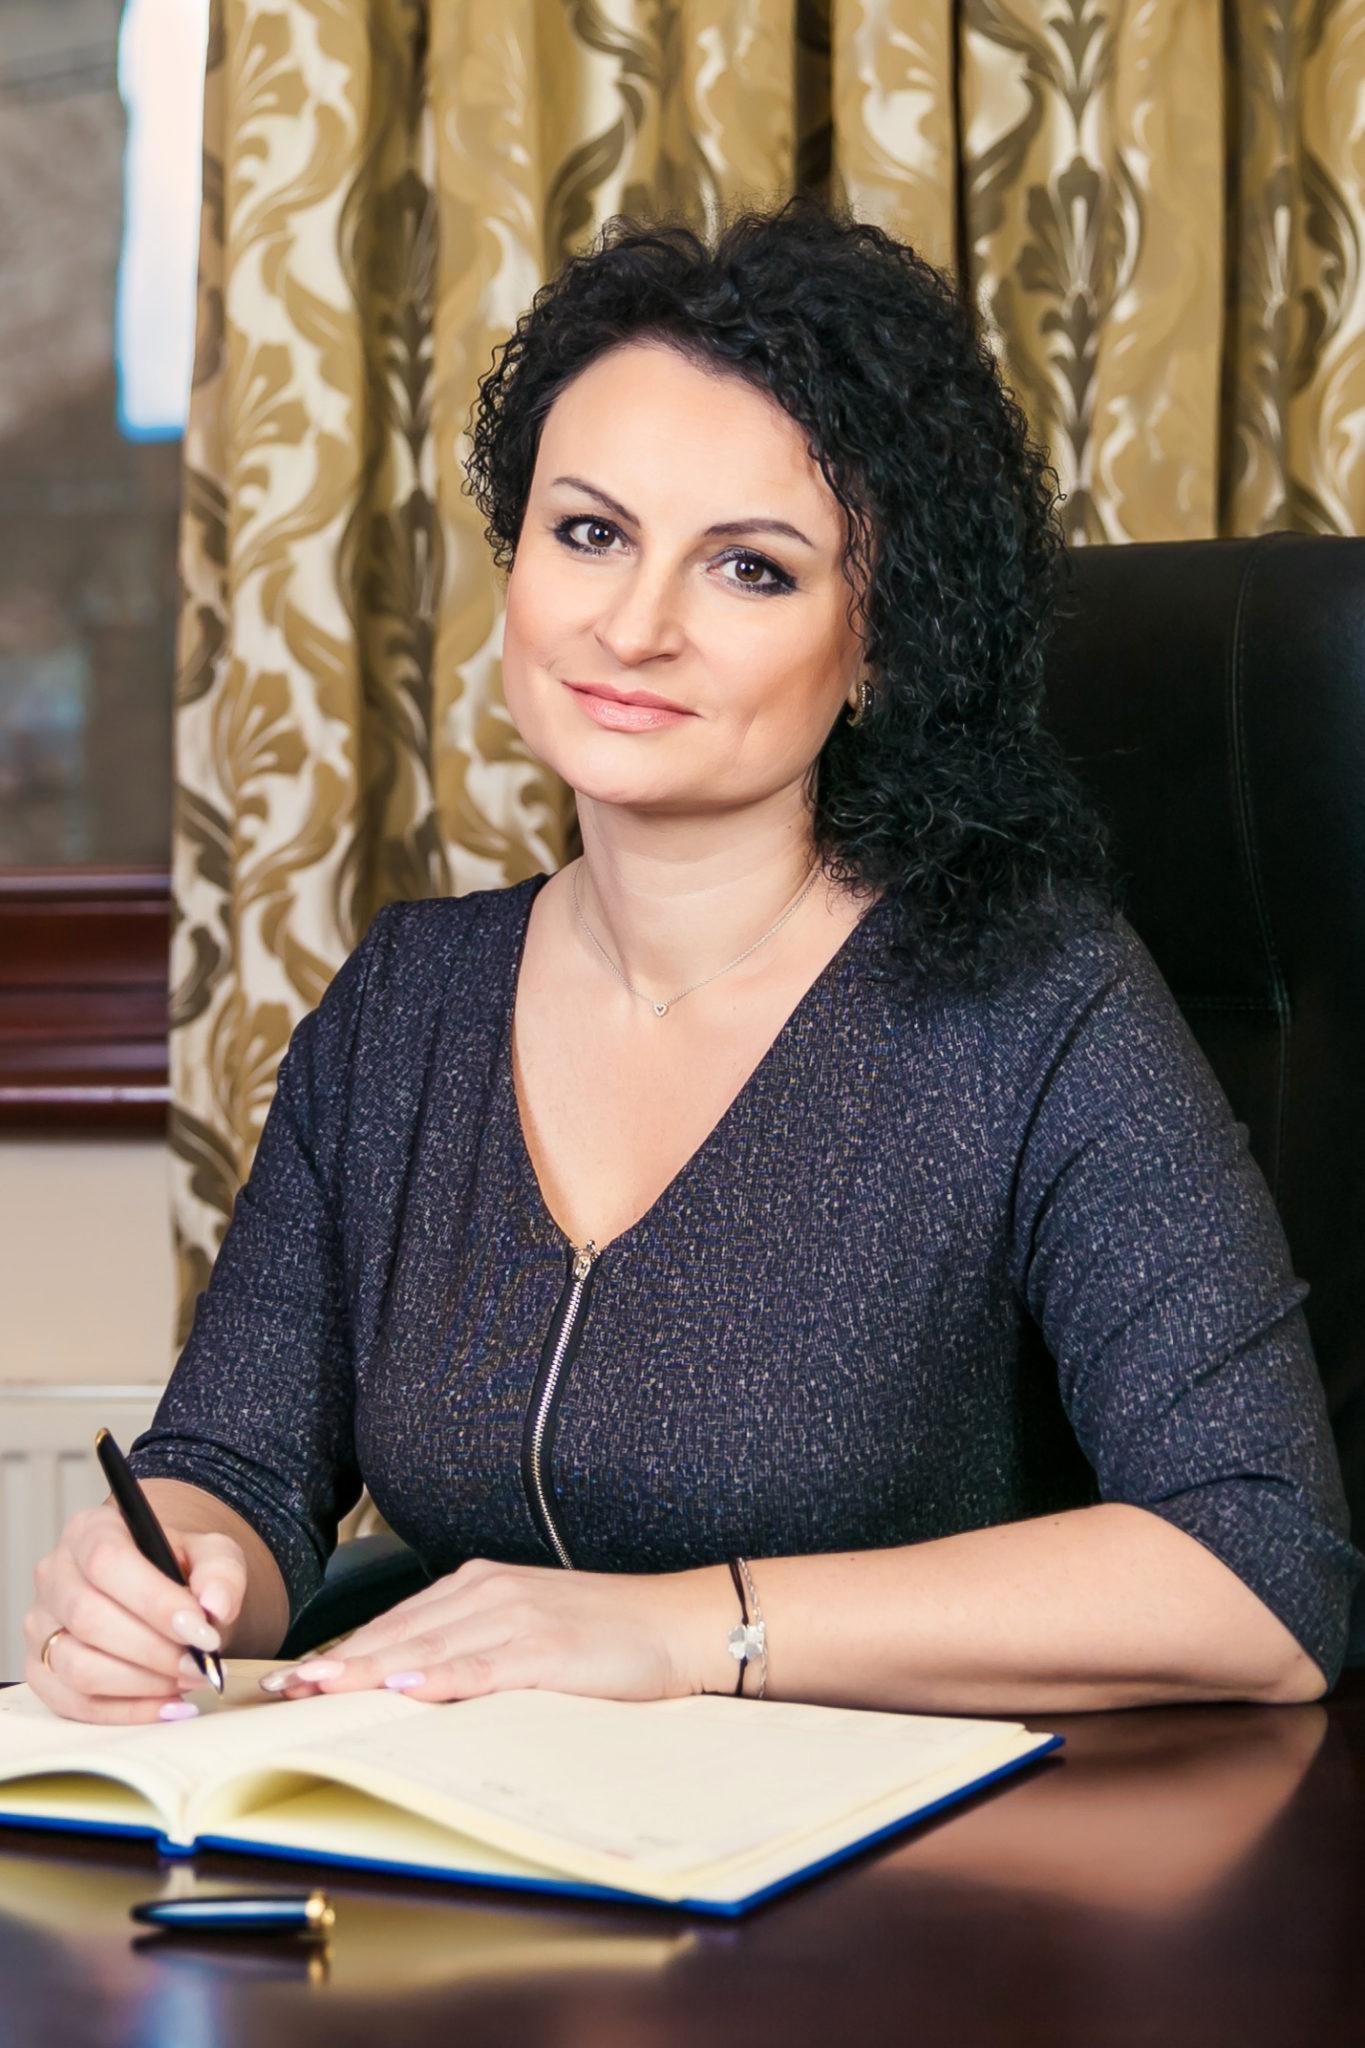 Agnieszka Klein